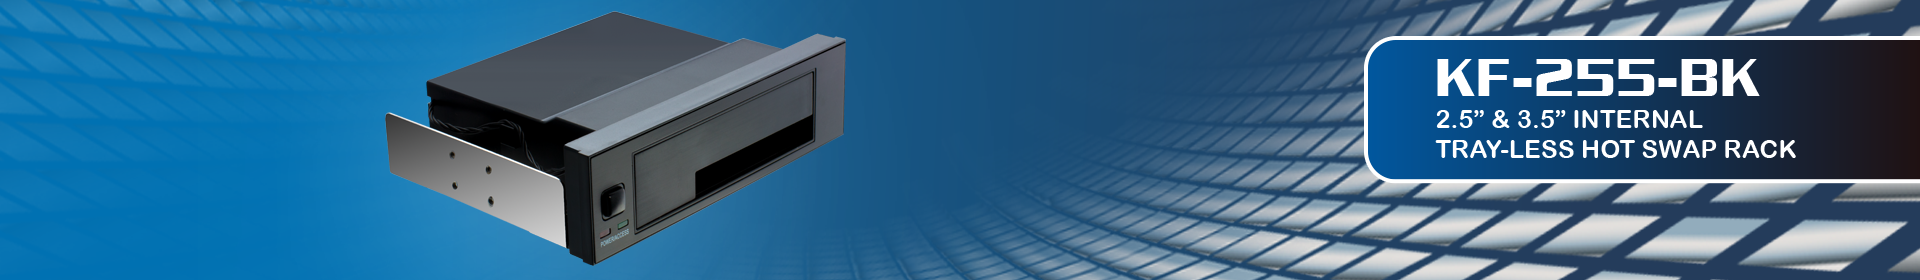 KF-255-BK_Product_Header